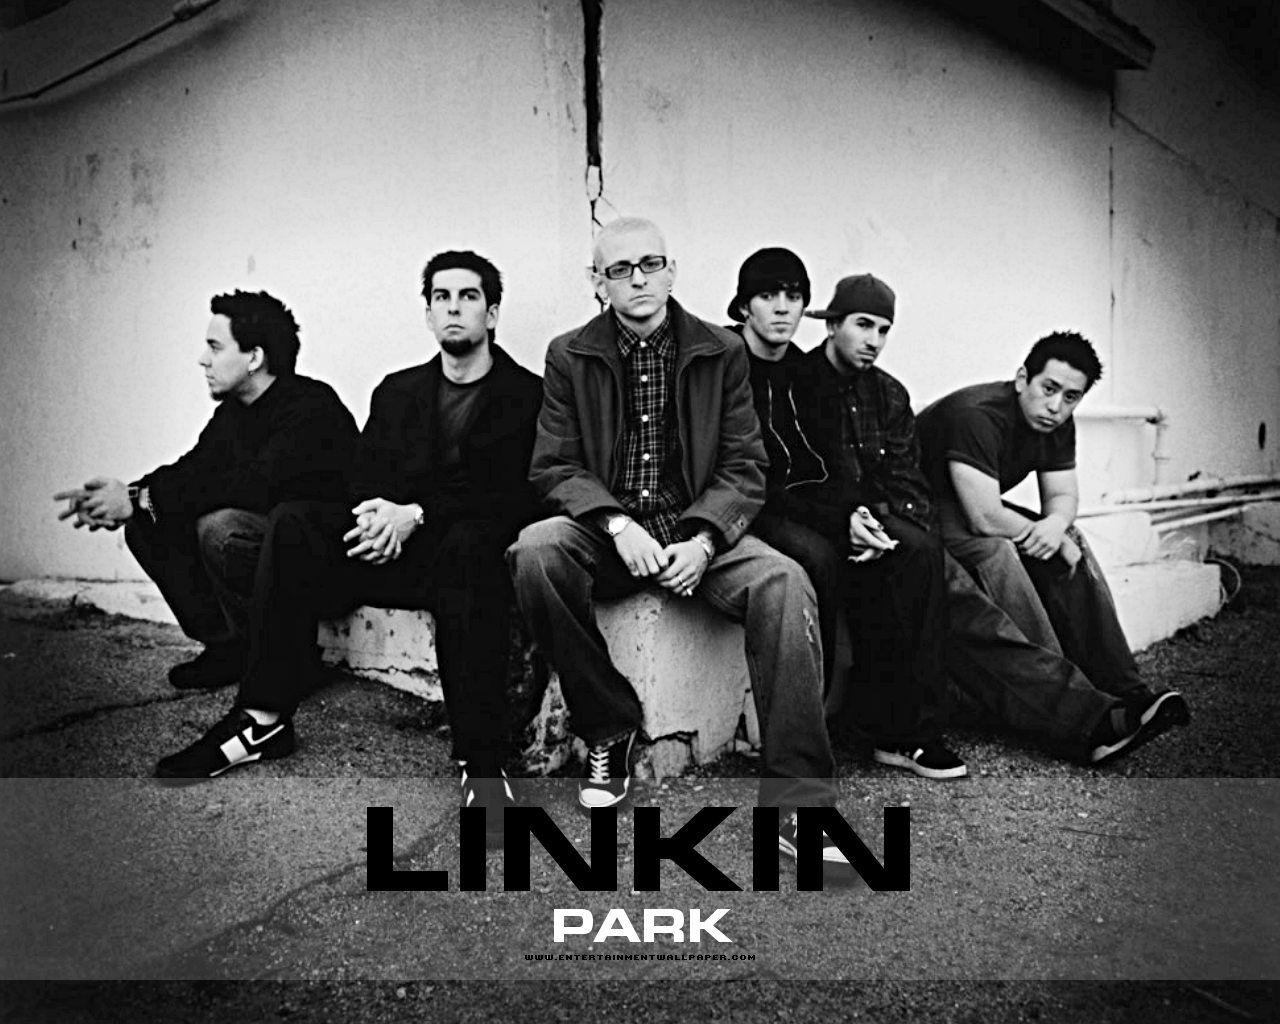 Linkin Park Wallpaper Linkin Park Linkin Park Wallpaper Linkin Park Linkin Park Chester